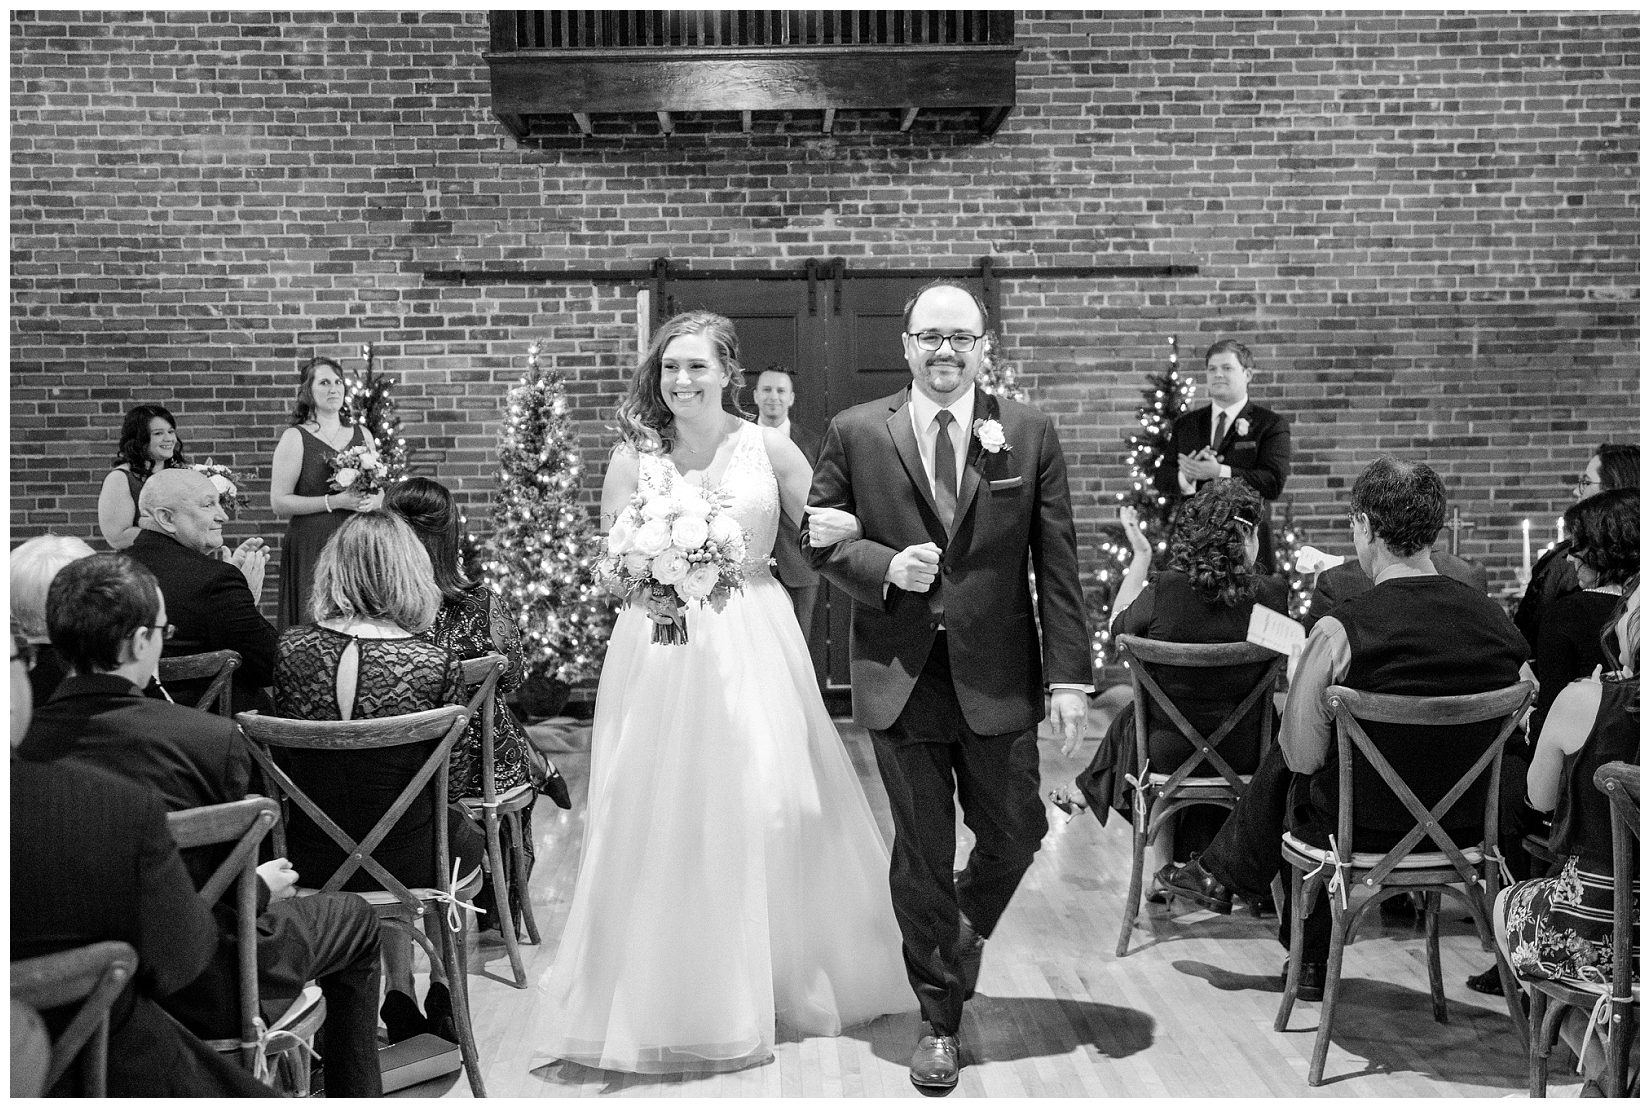 cat-alkire-wedding-photographer-indiana-chicago-indianapolis-fort-wayne_0952.jpg